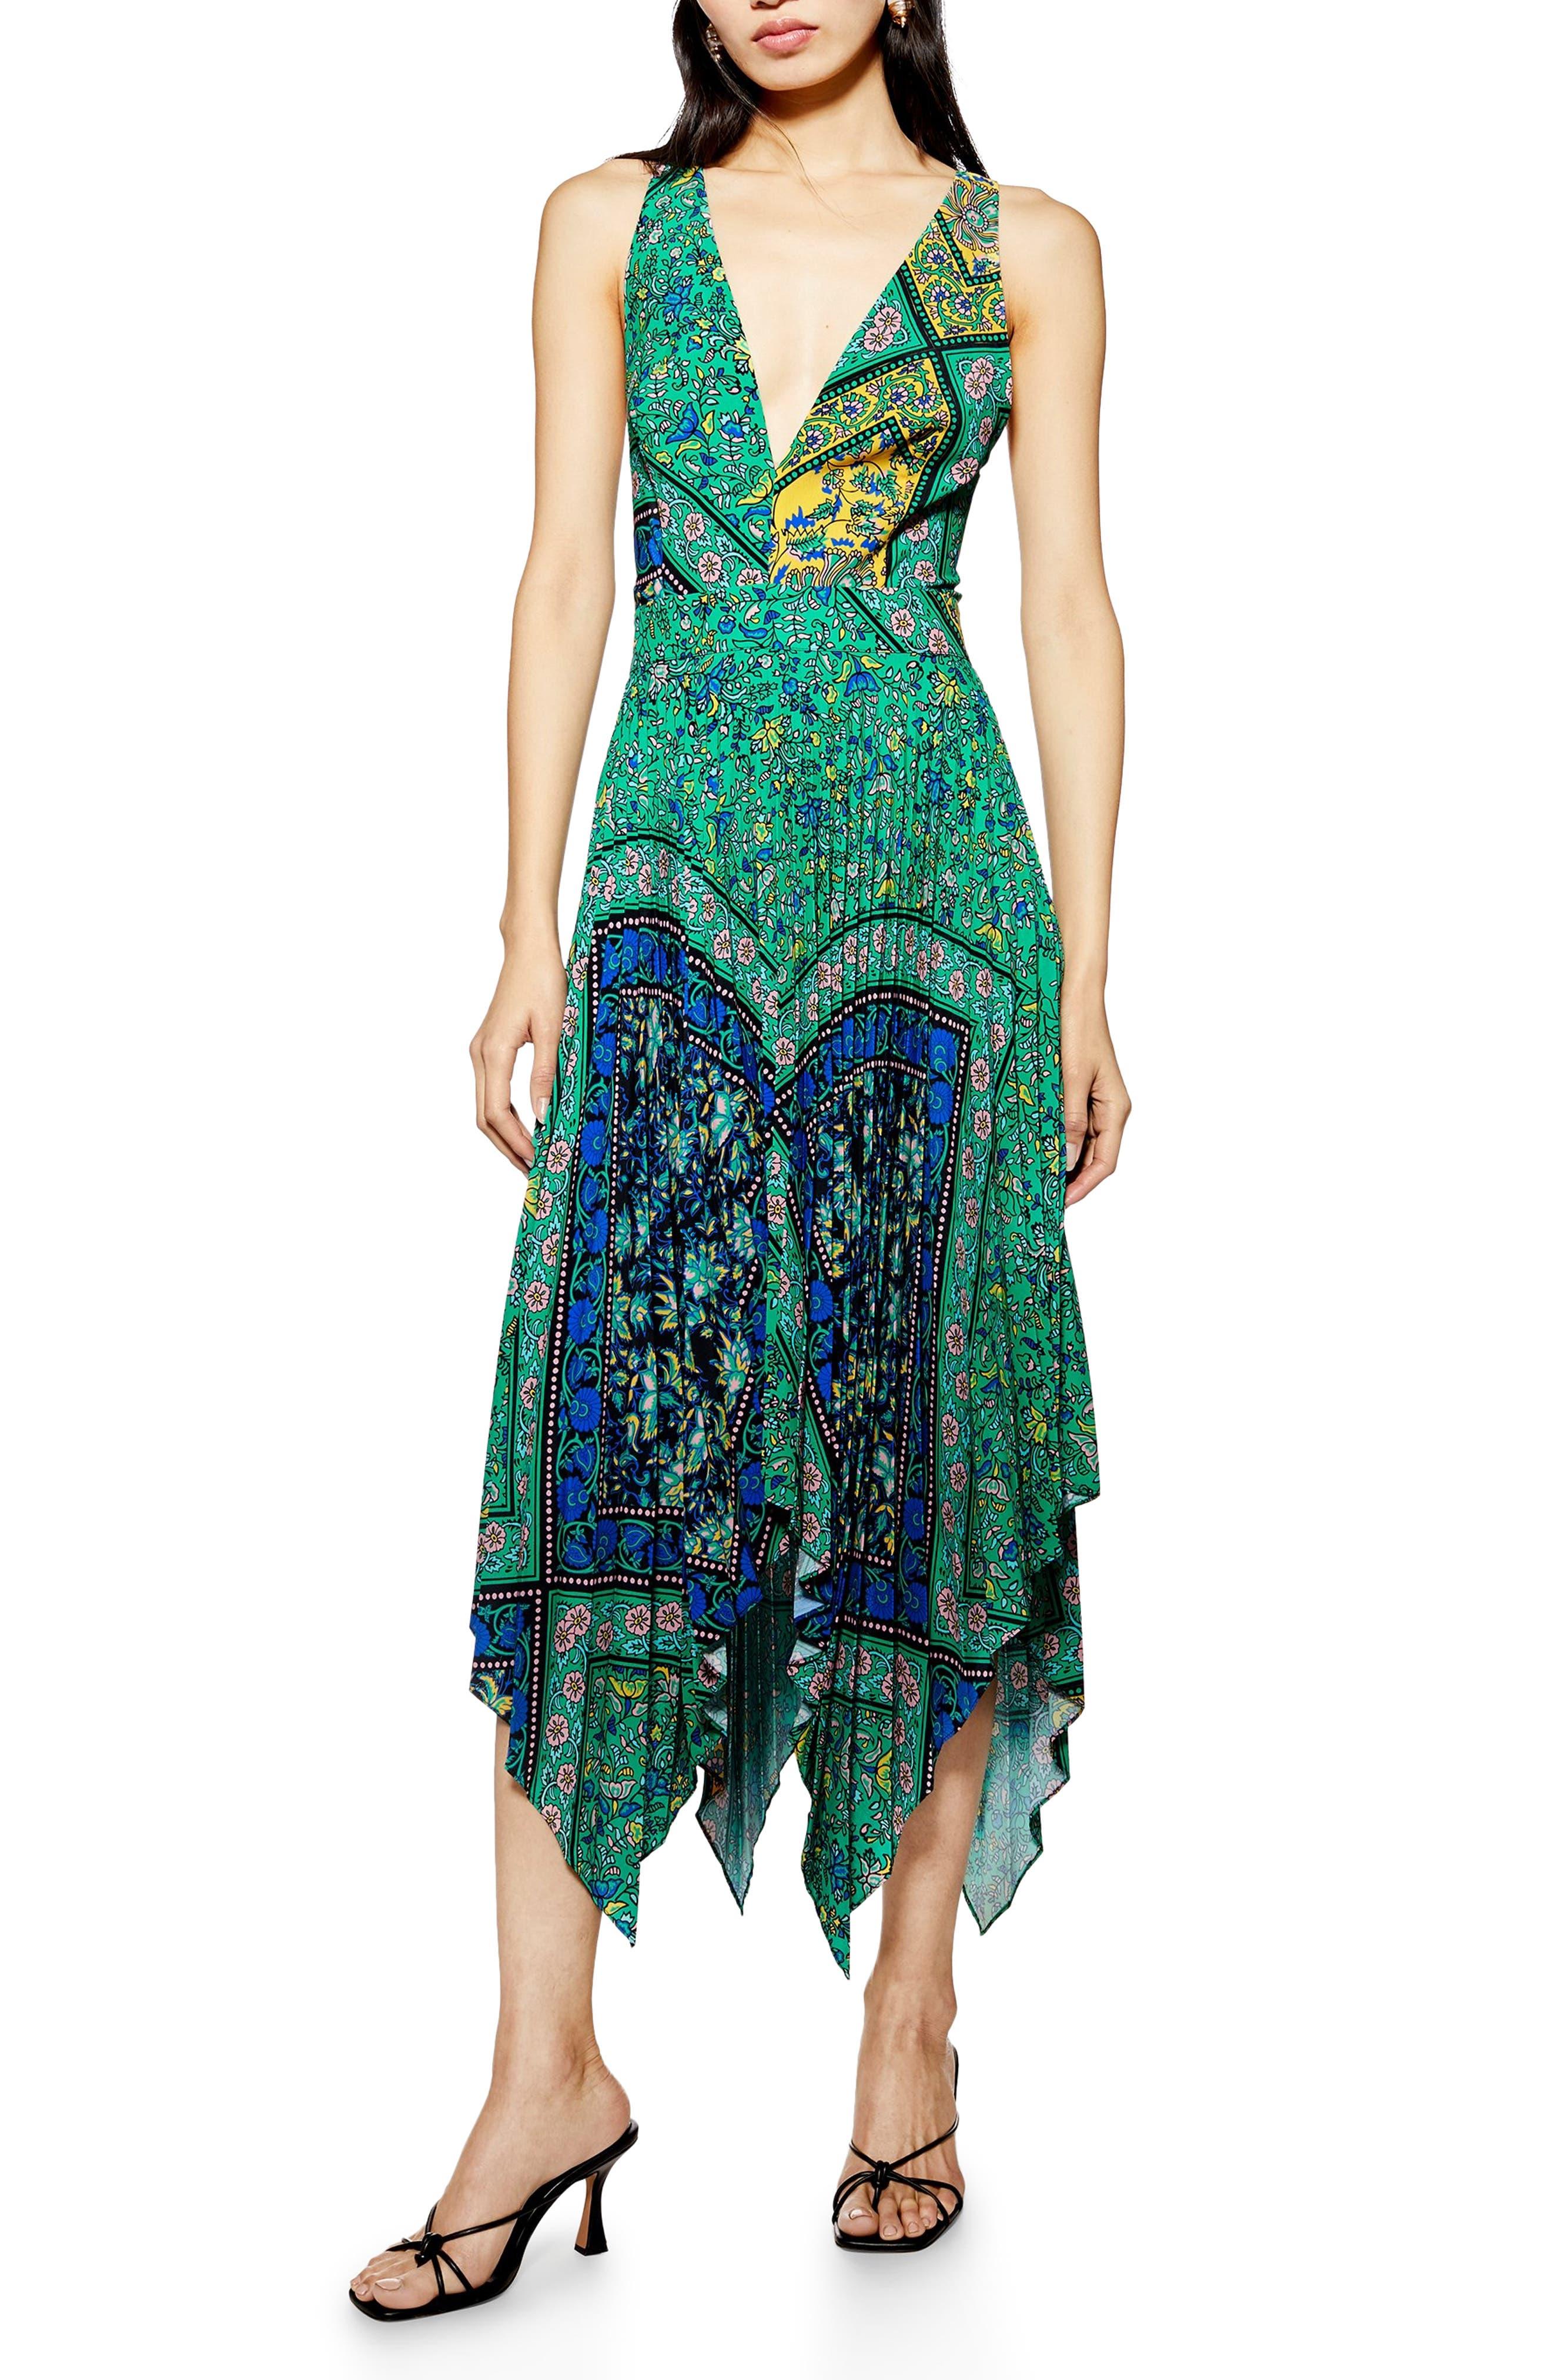 Topshop Paisley Handkerchief Hem Pinafore Midi Dress, US (fits like 0-2) - Green